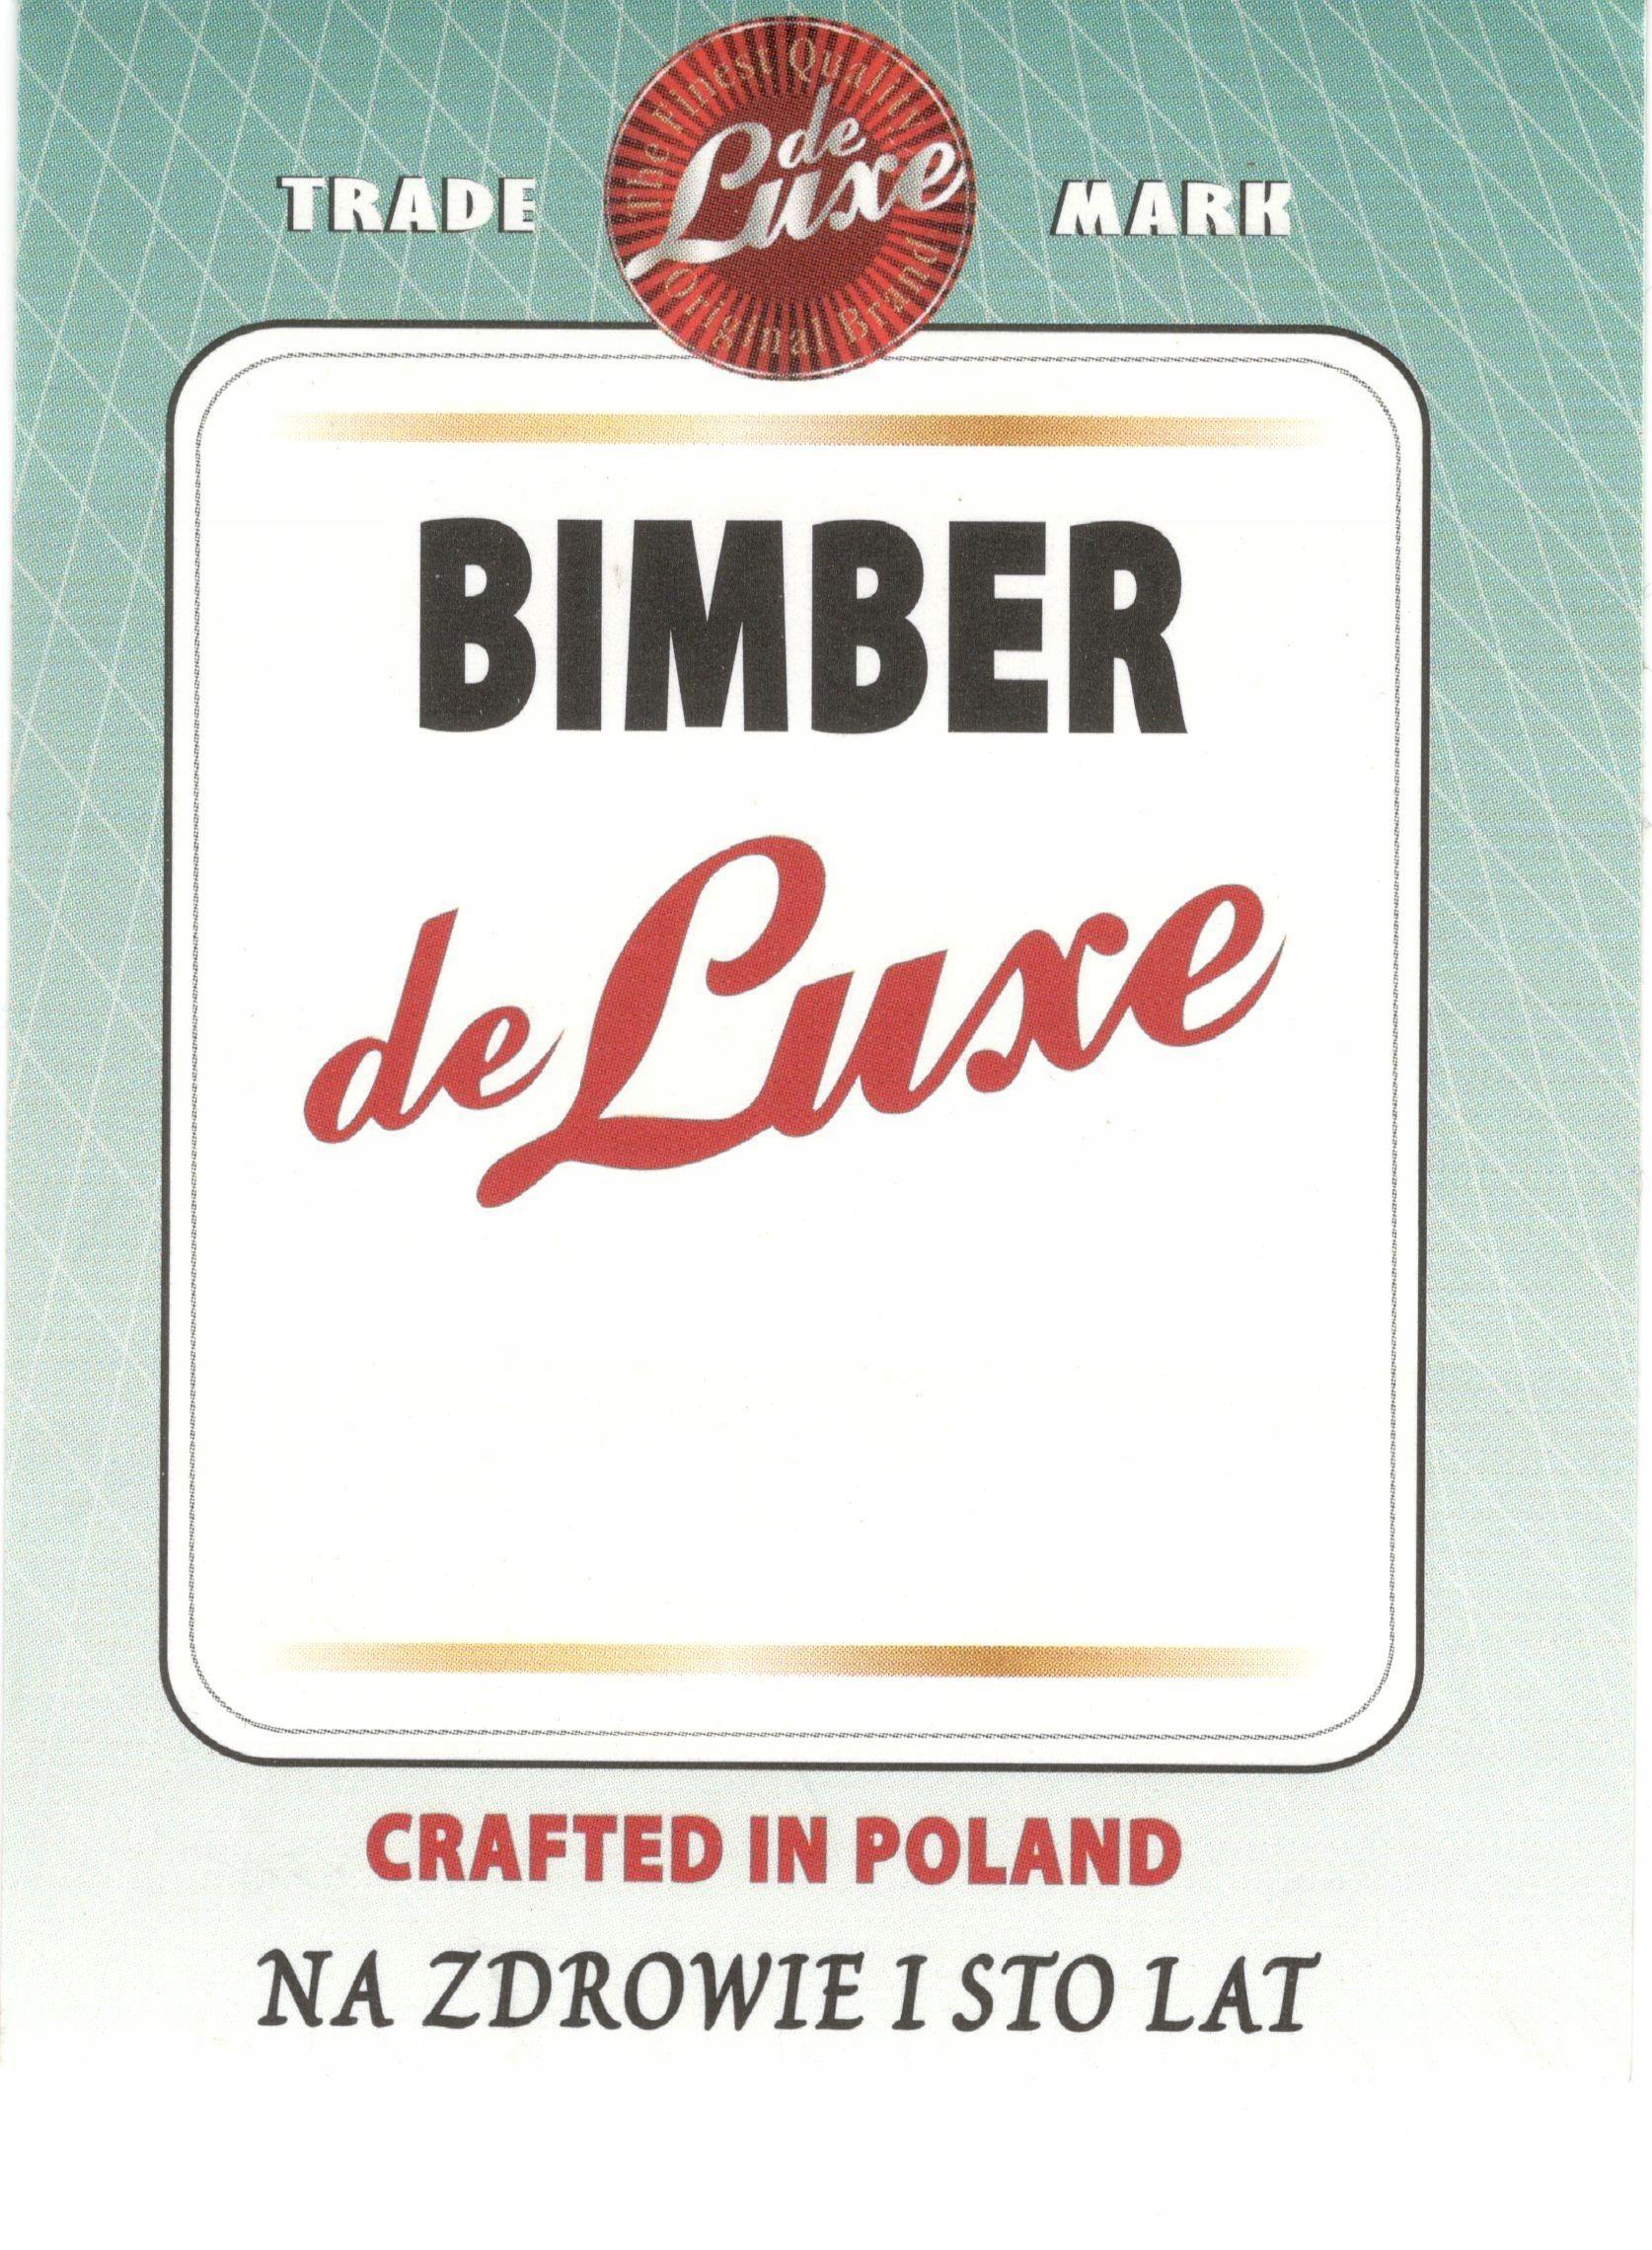 Etykiety na bimber - Bimber de luxe - 10 sztuk